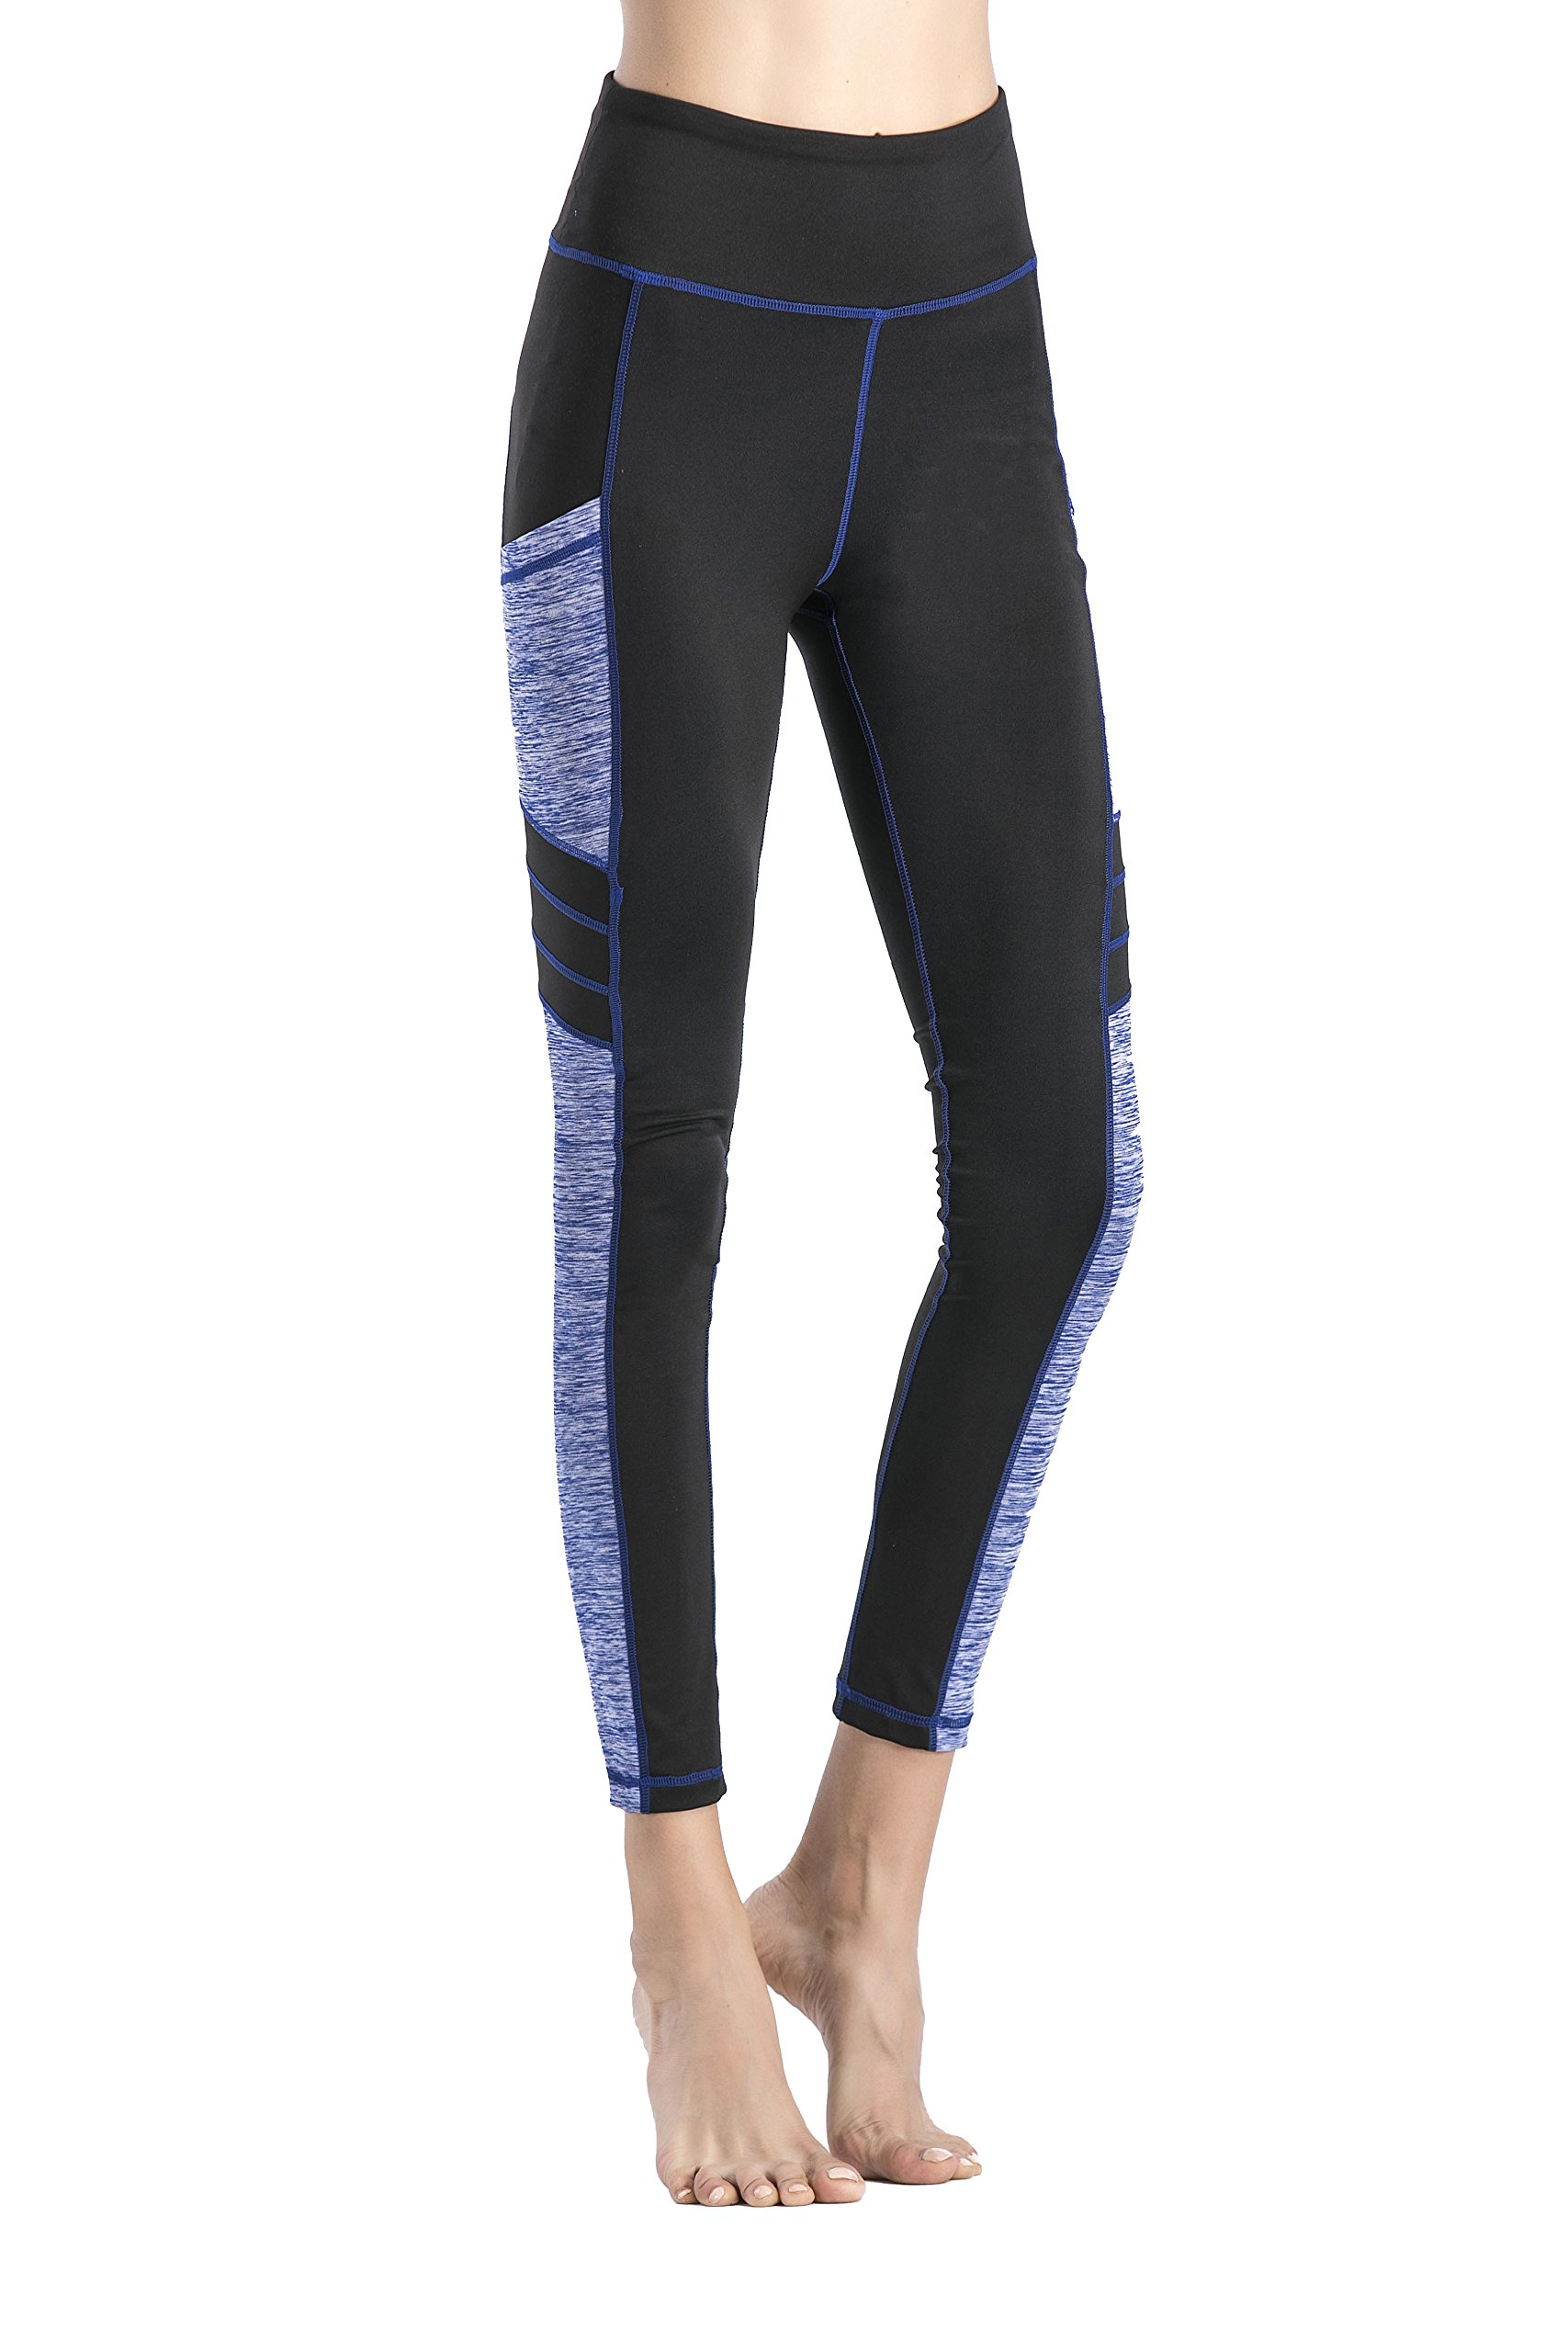 IMIDO Women\'s Yoga Capri Pants Sport Tights Workout Running Mesh Leggings with Side Pocket (Long Pants Blue, S)